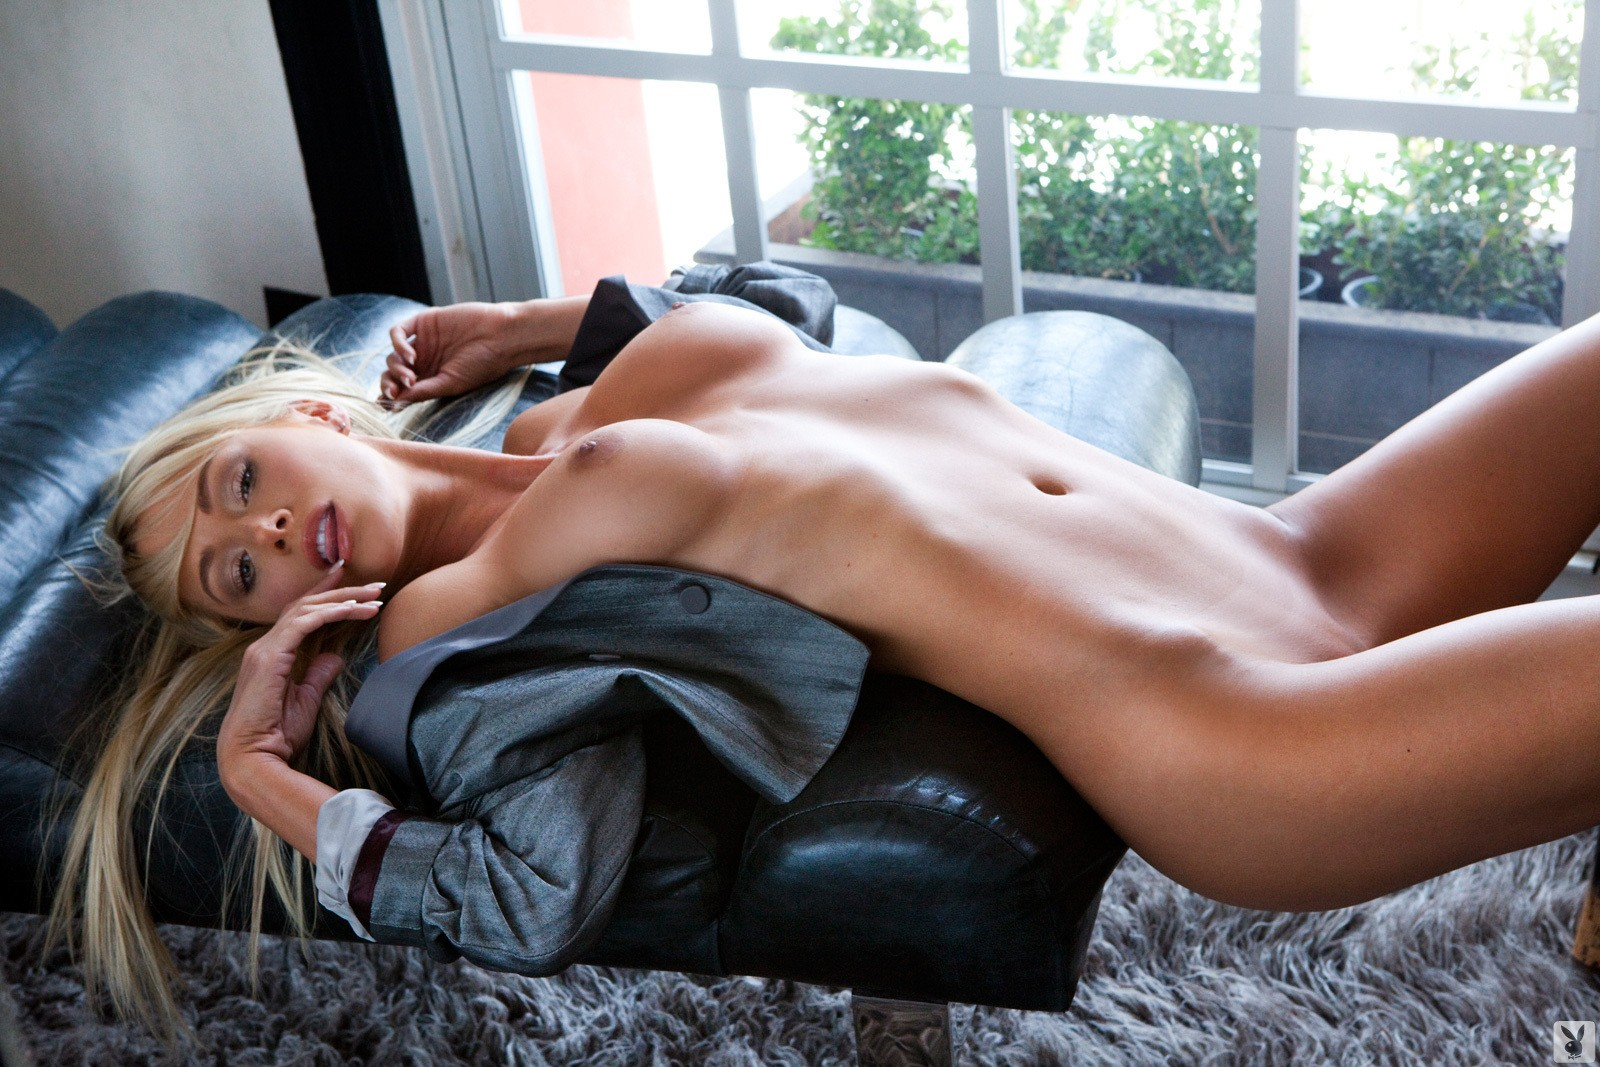 Celebrity fakes porn photos of jennie garth